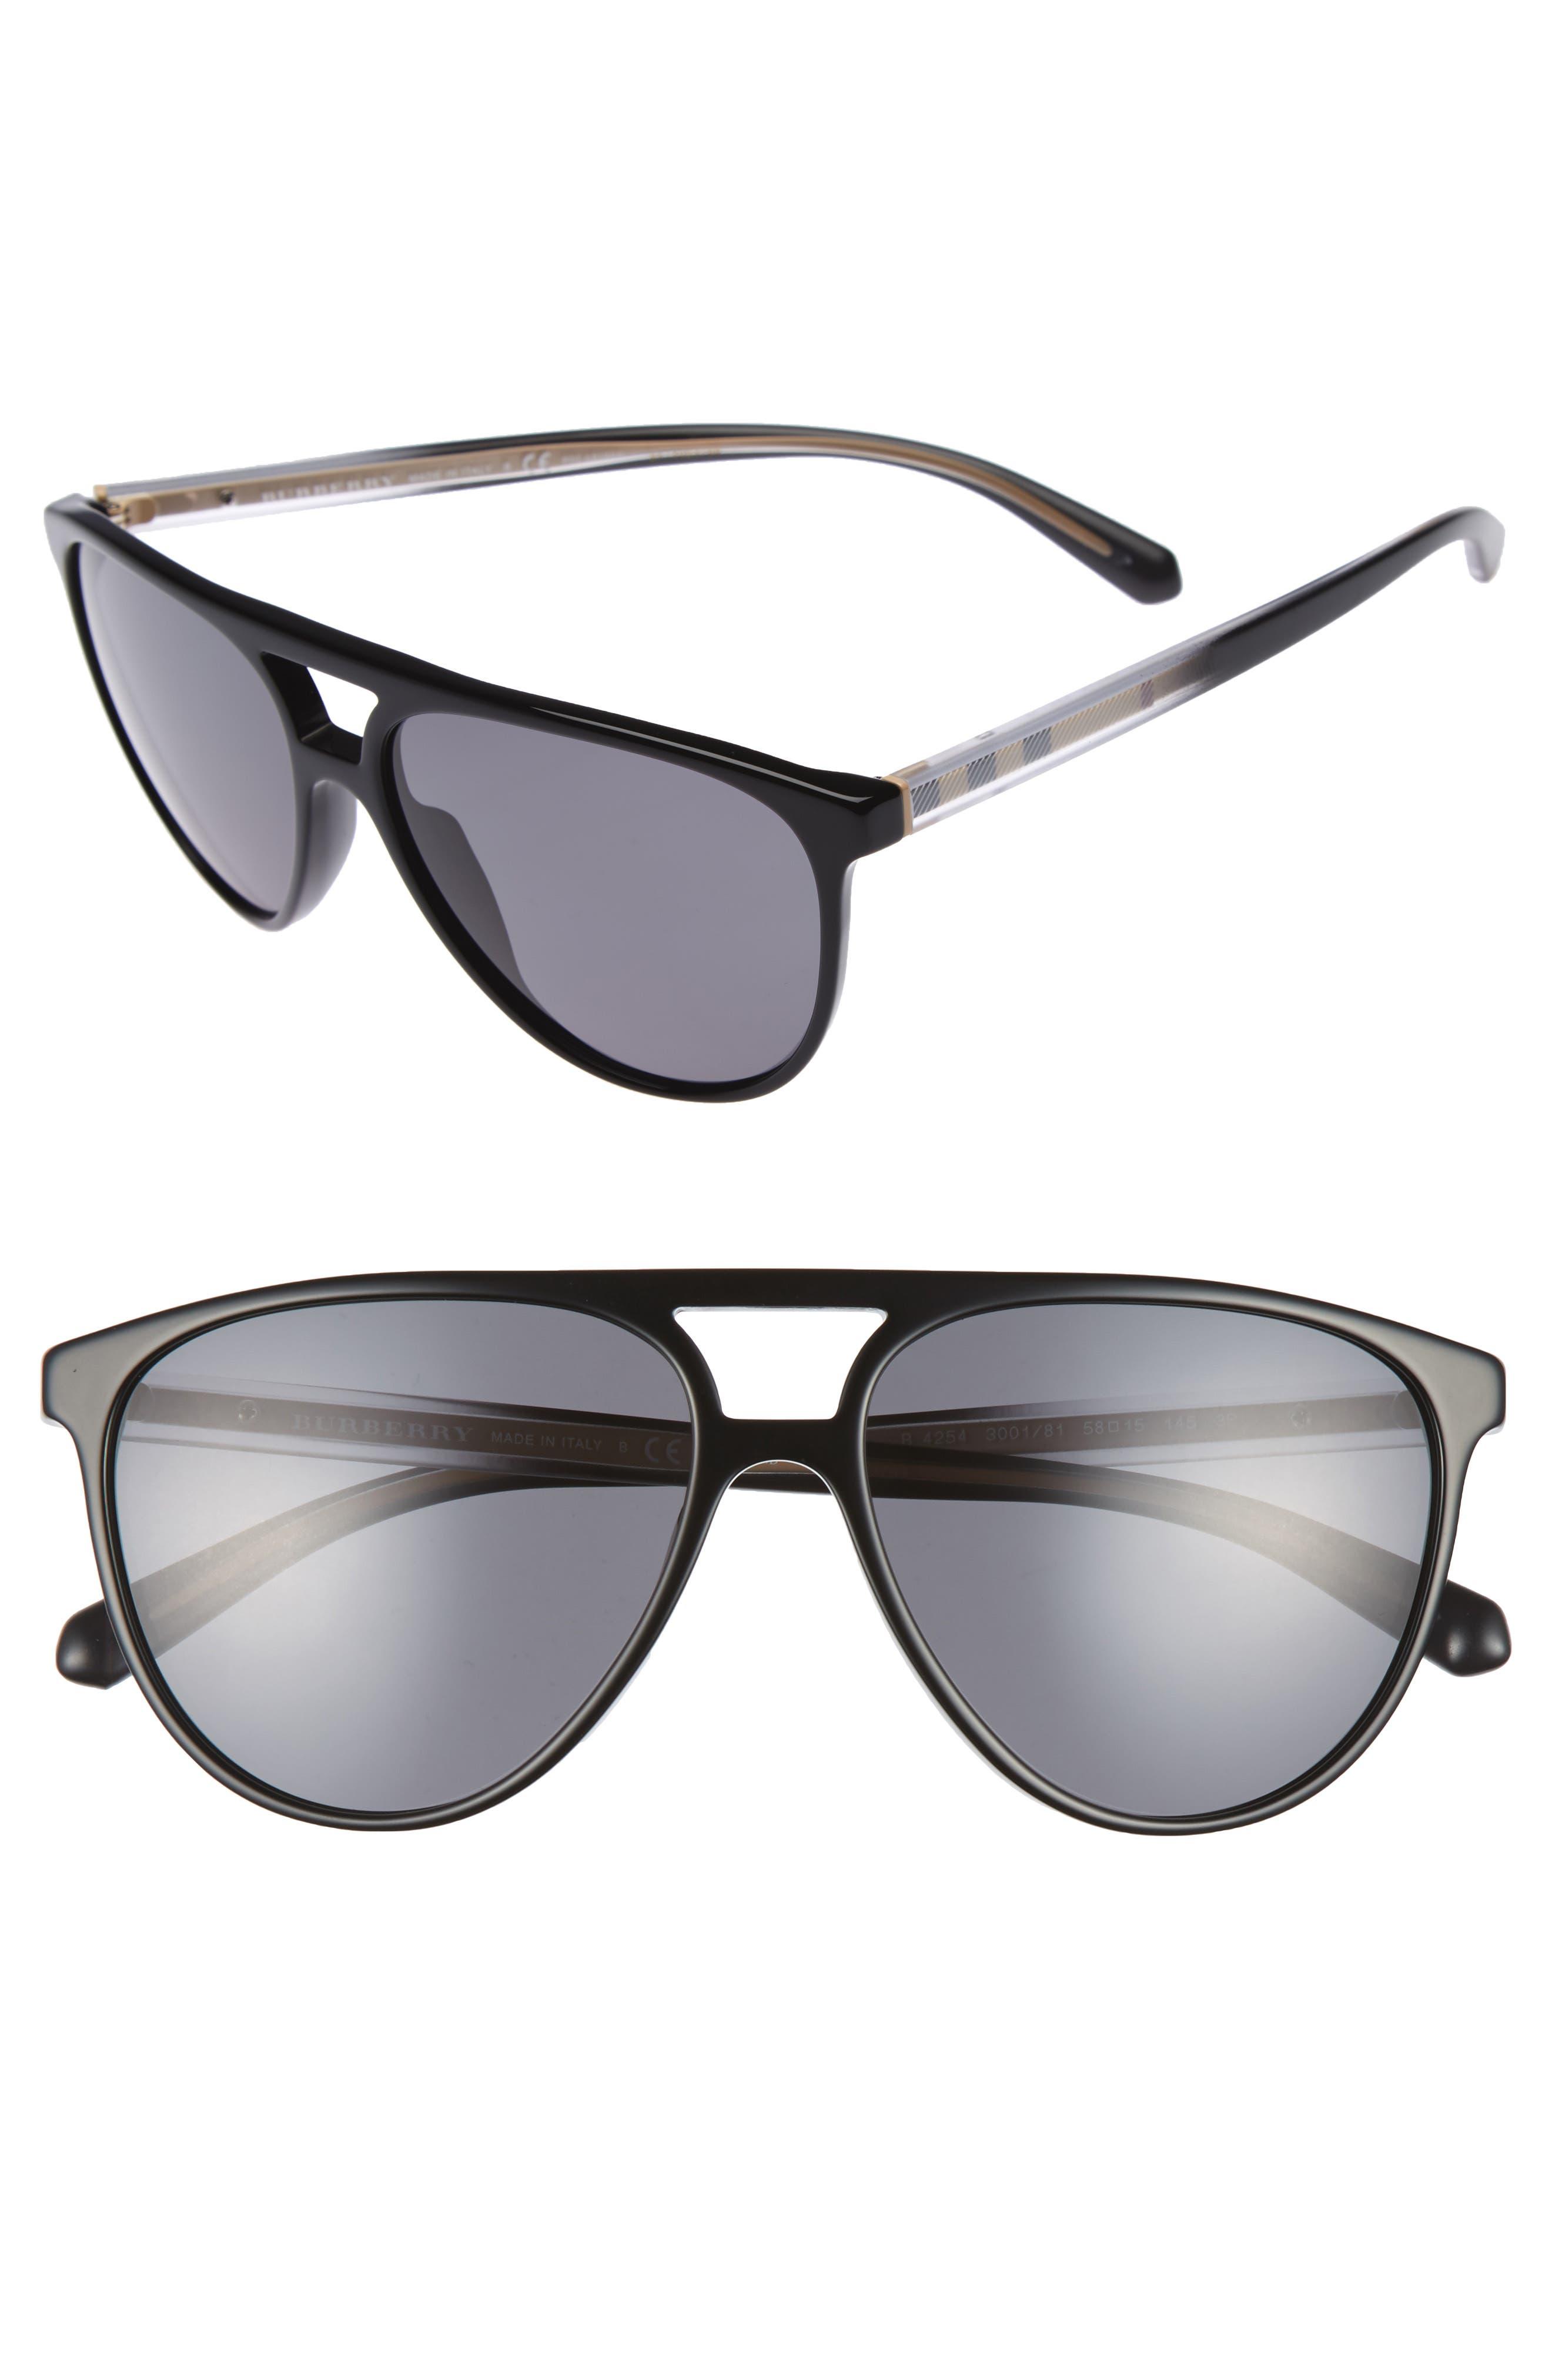 Main Image - Burberry 58mm Polarized Aviator Sunglasses